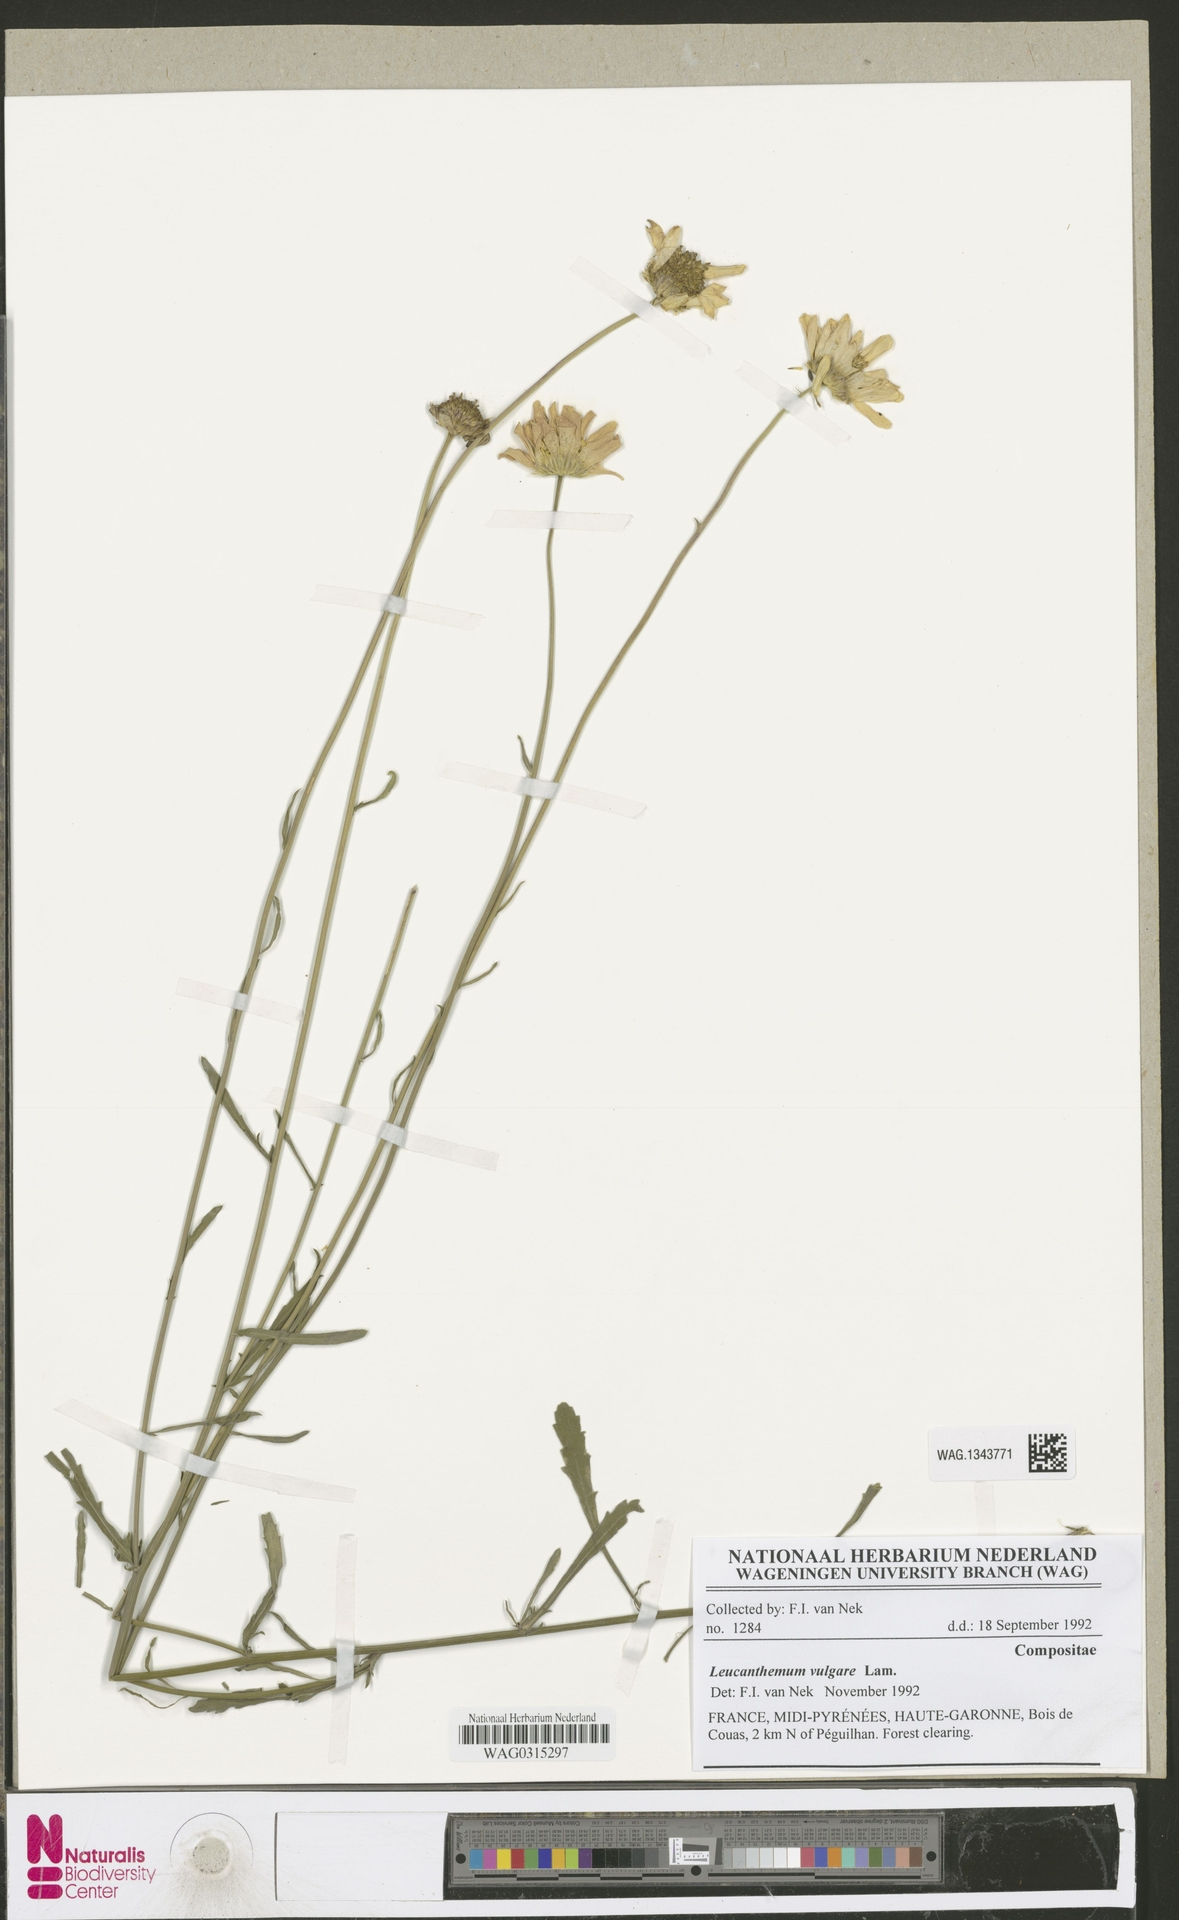 WAG.1343771   Leucanthemum vulgare Lam.